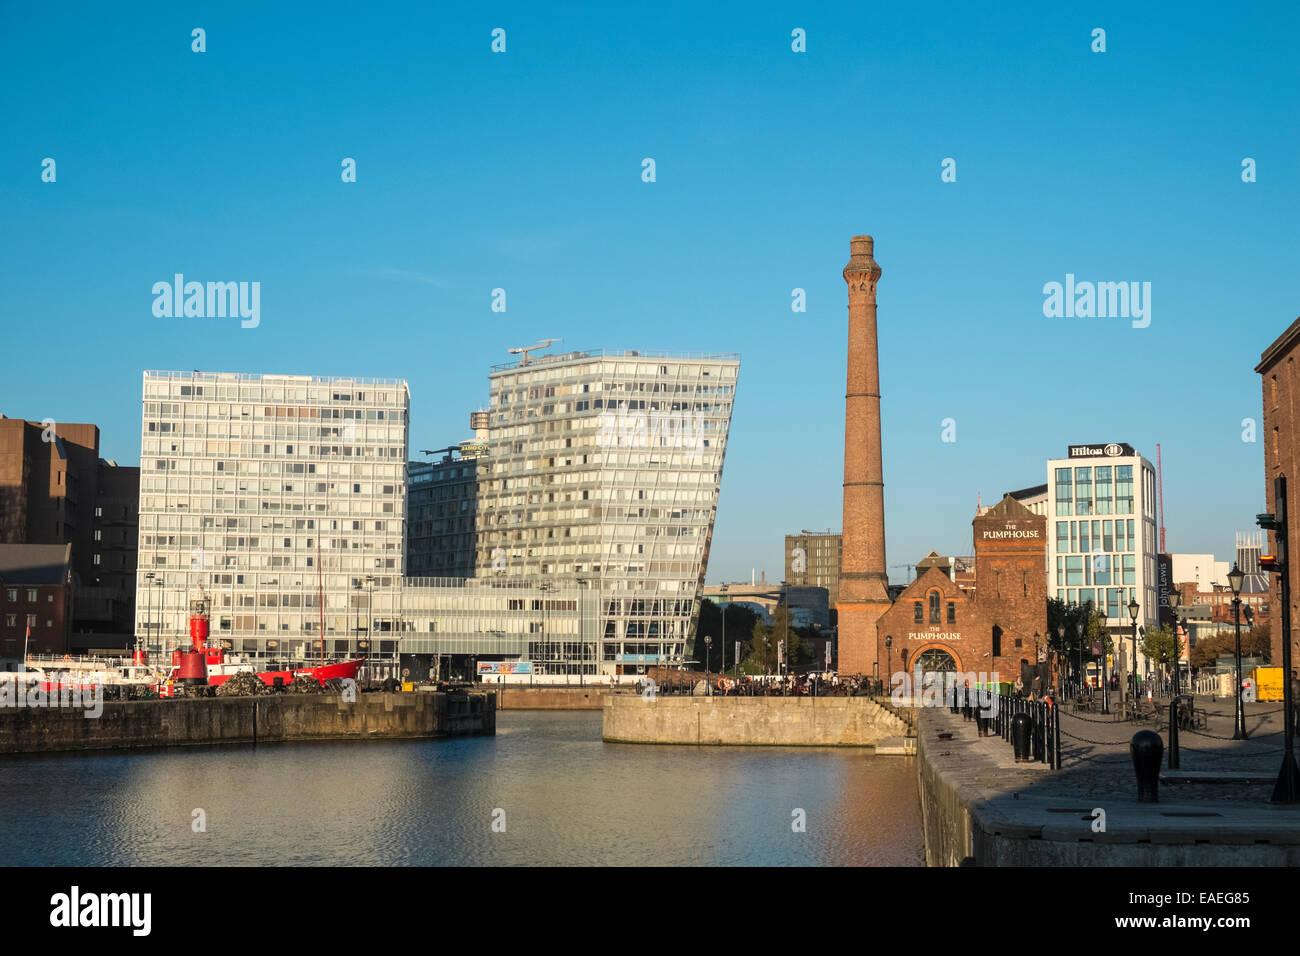 Stadtzentrum Liverpool Stockfotos & Stadtzentrum Liverpool Bilder ...